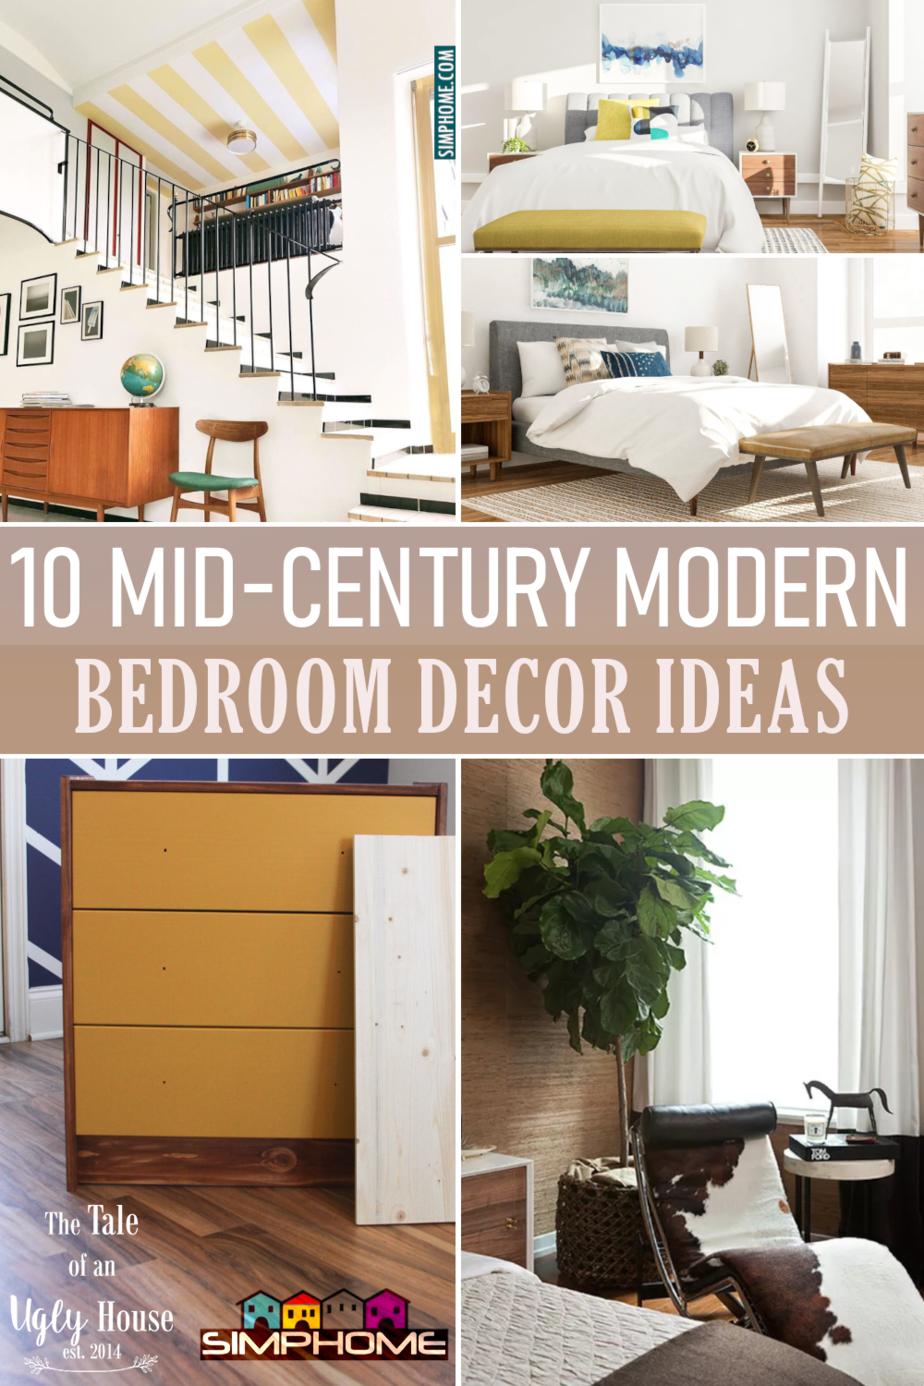 10 Mid century Modern Bedroom Decor Ideas via Simphome.com Featured Image